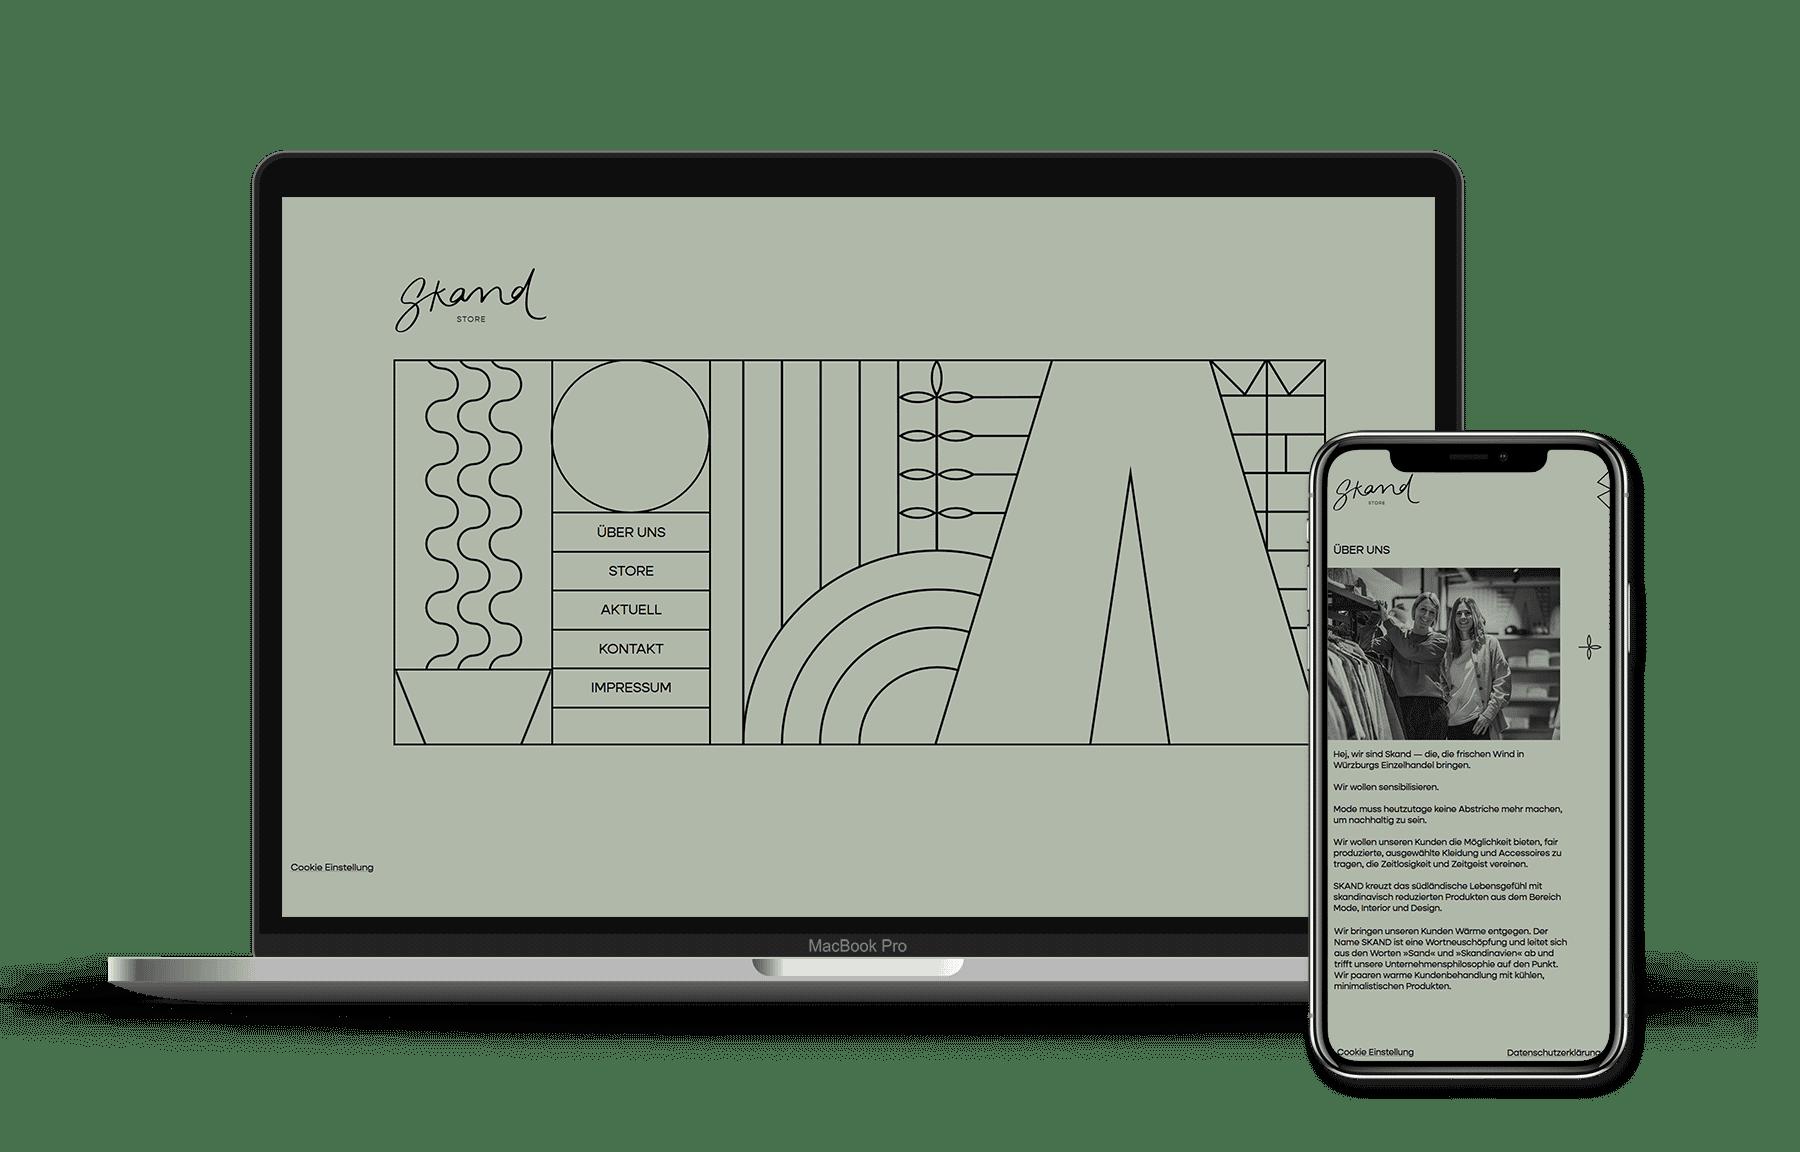 id23 Webdesign - Skand-Store Würzburg